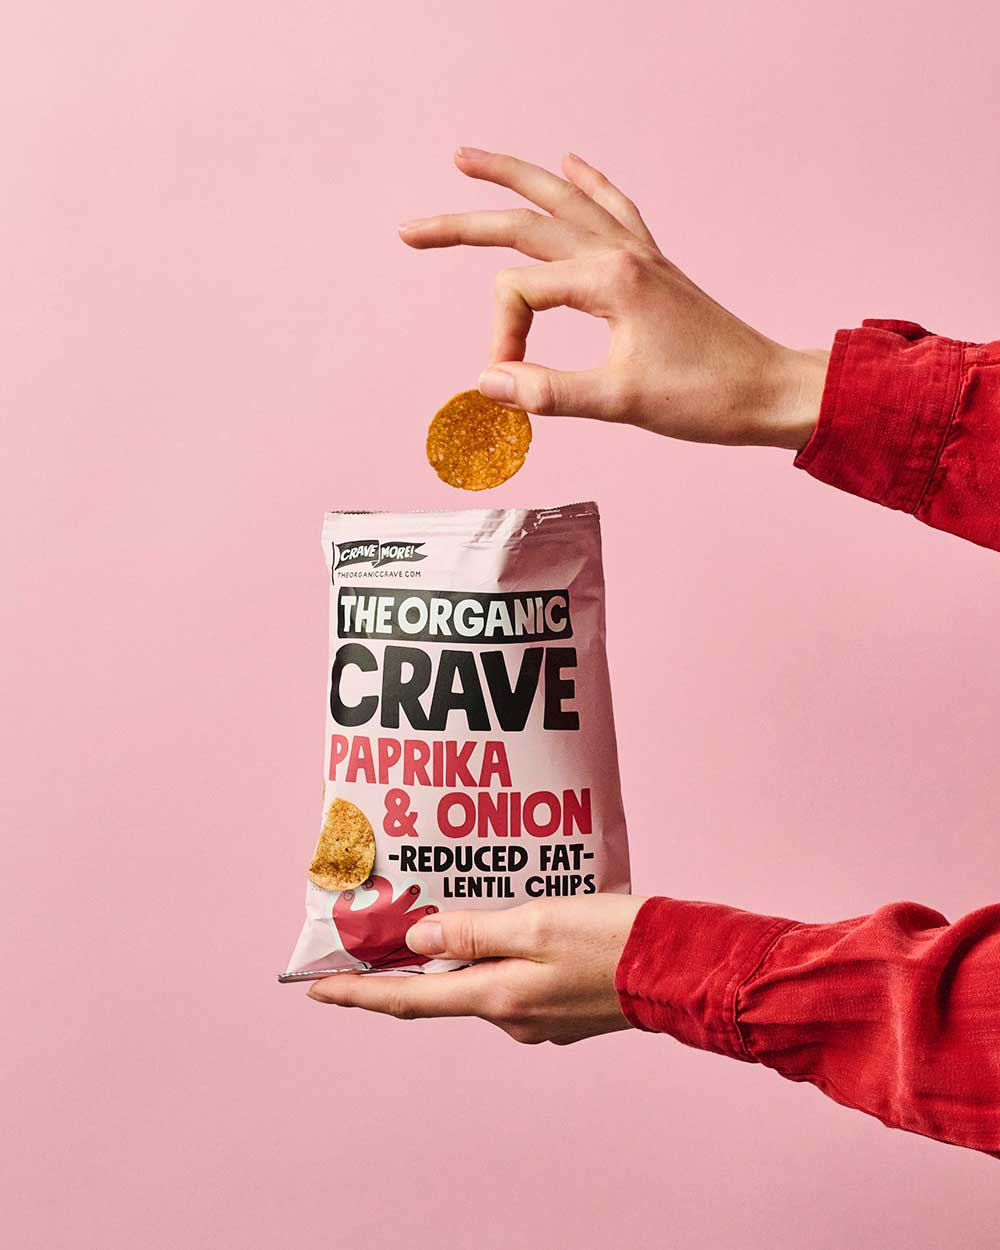 The Organic Crave